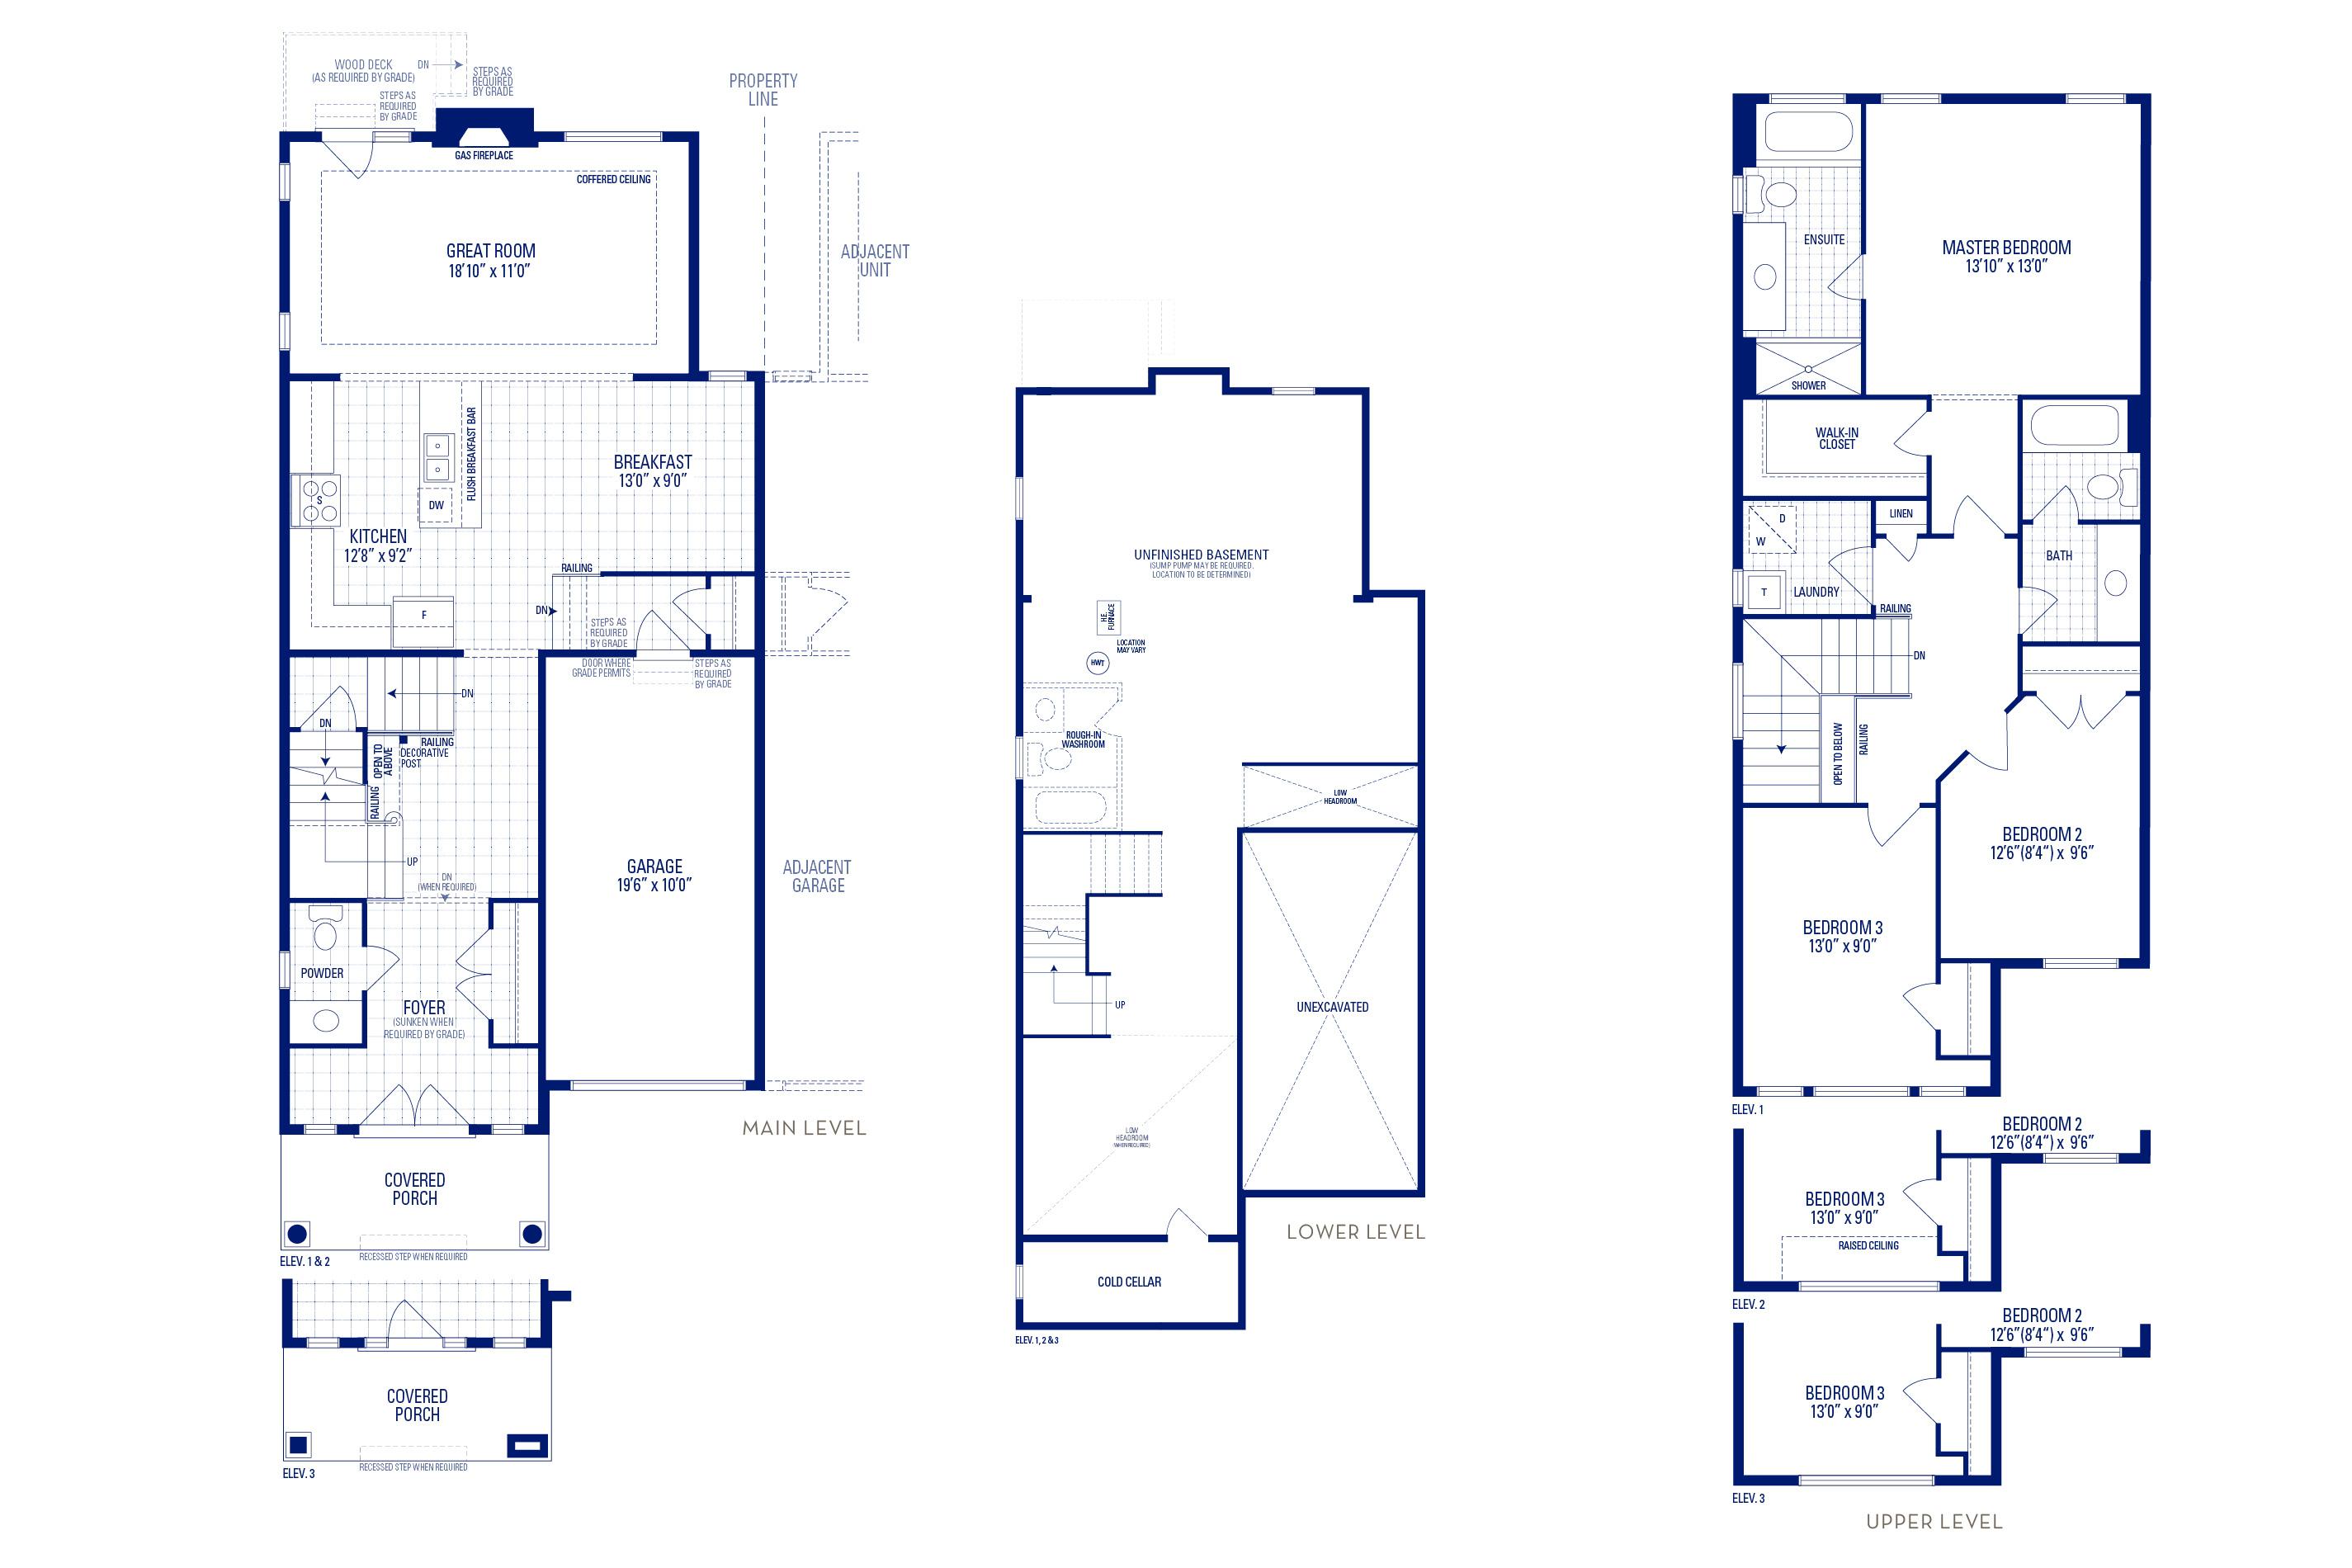 Newberry 1 Elev. 1 Floorplan